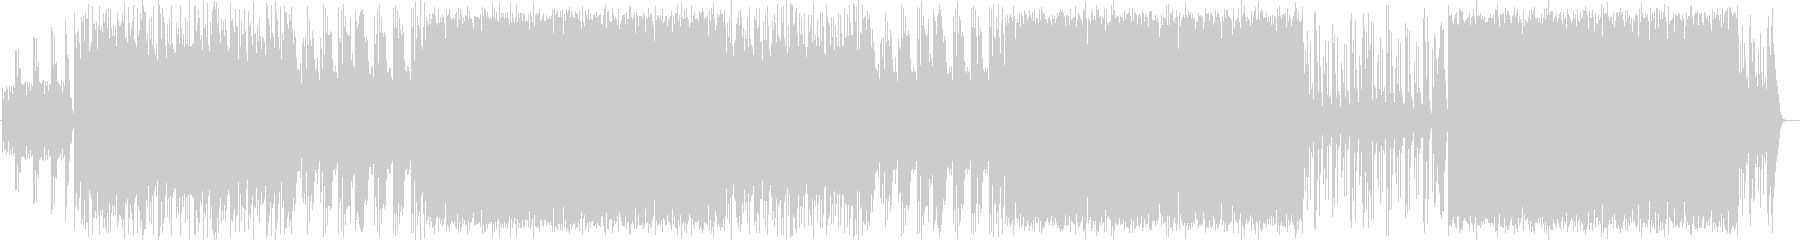 和風/和楽器(三味線・琴・太鼓)/B2の未再生の波形